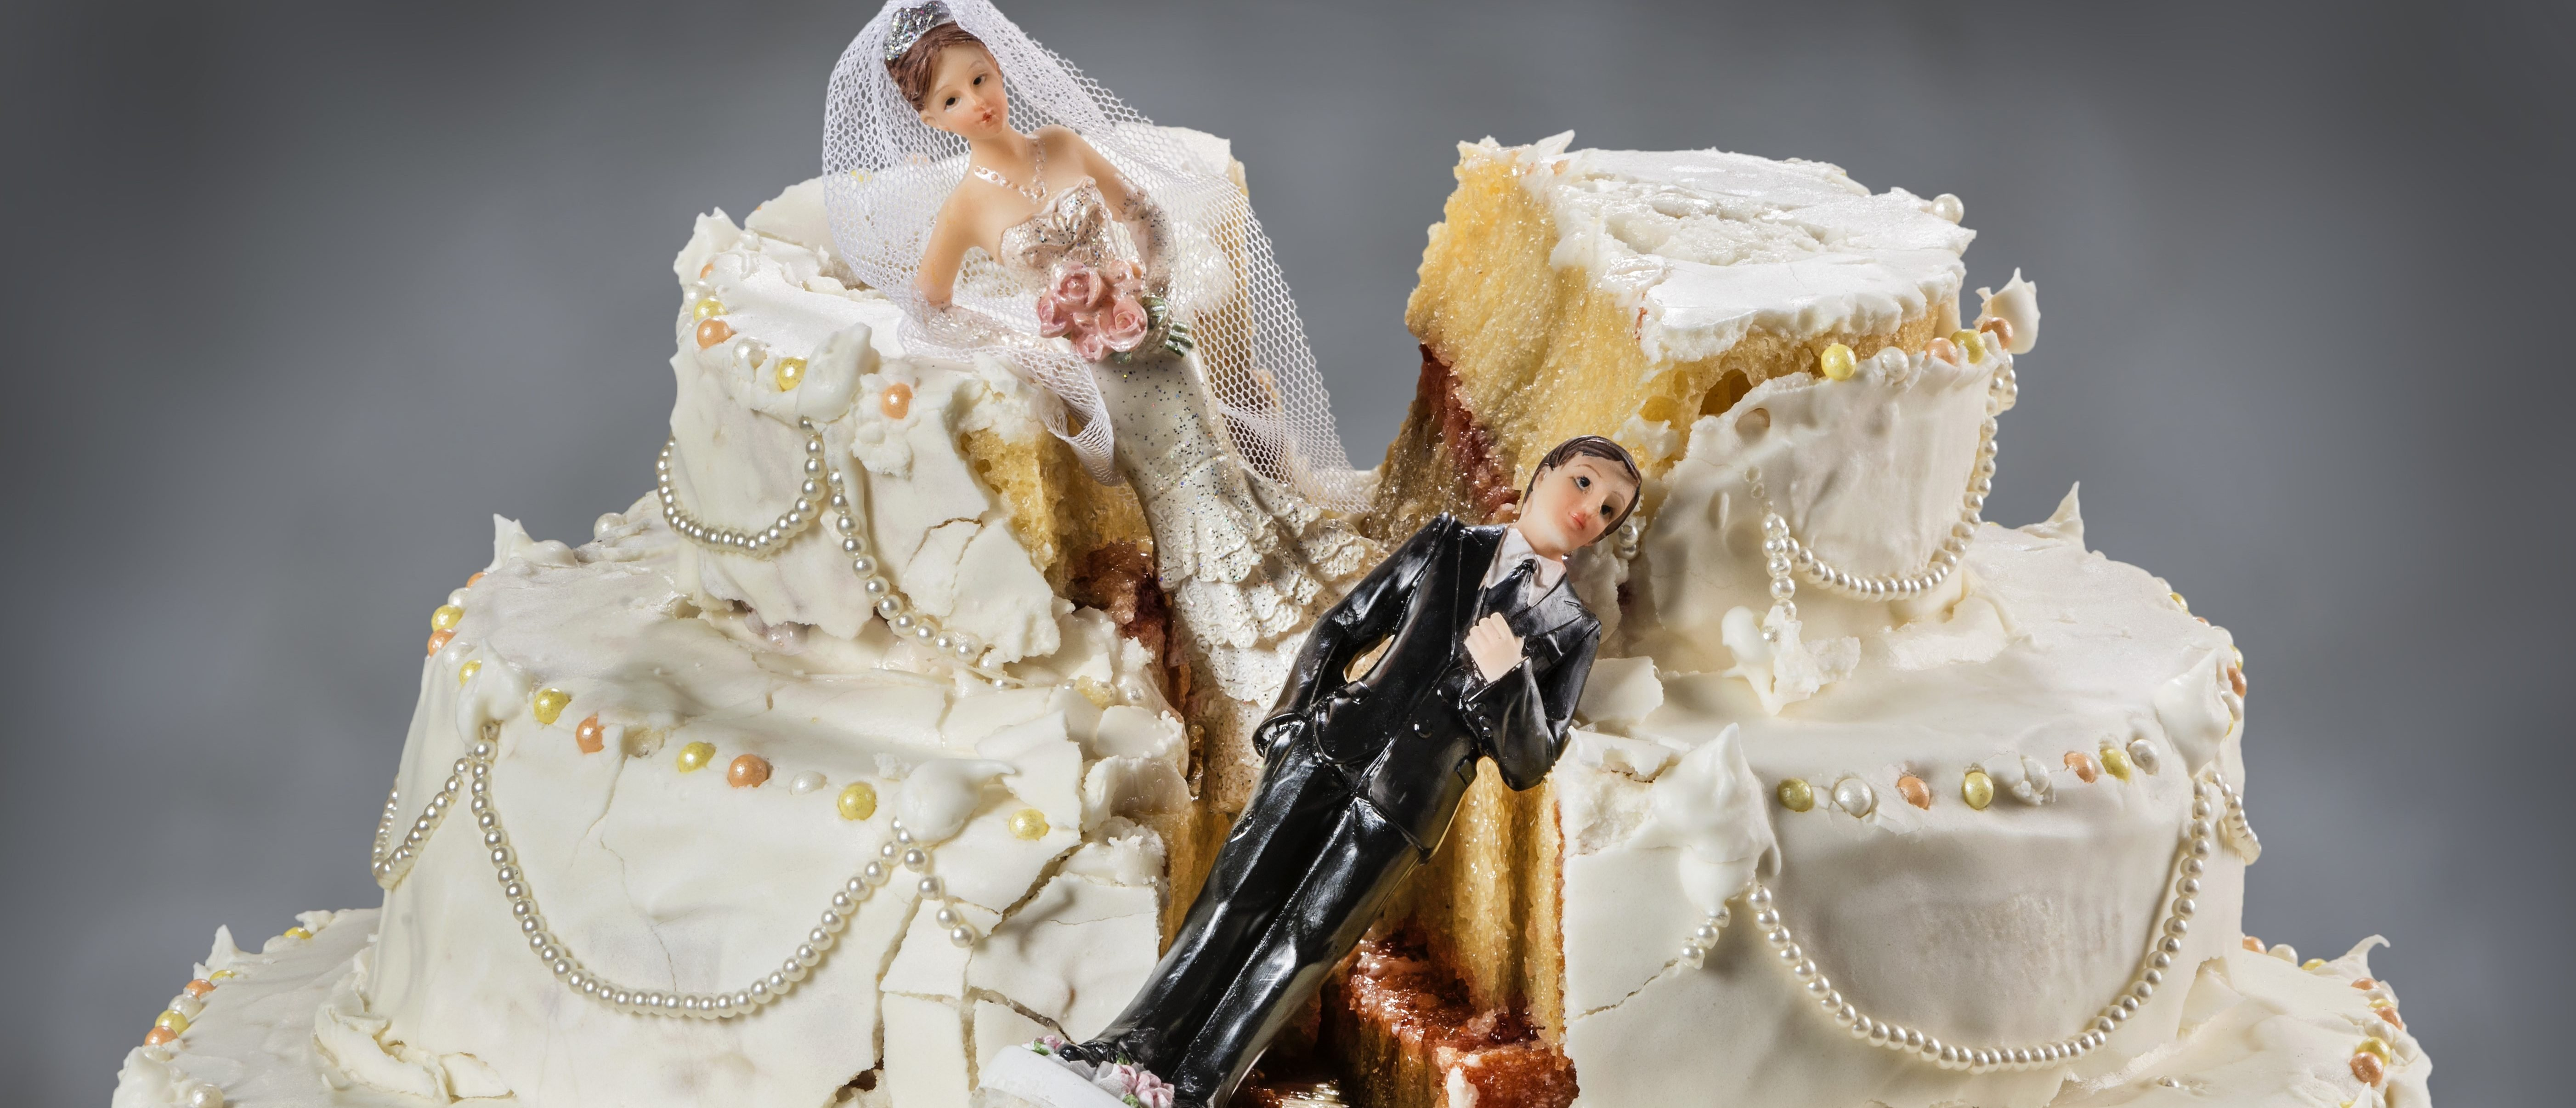 Wedding cuck